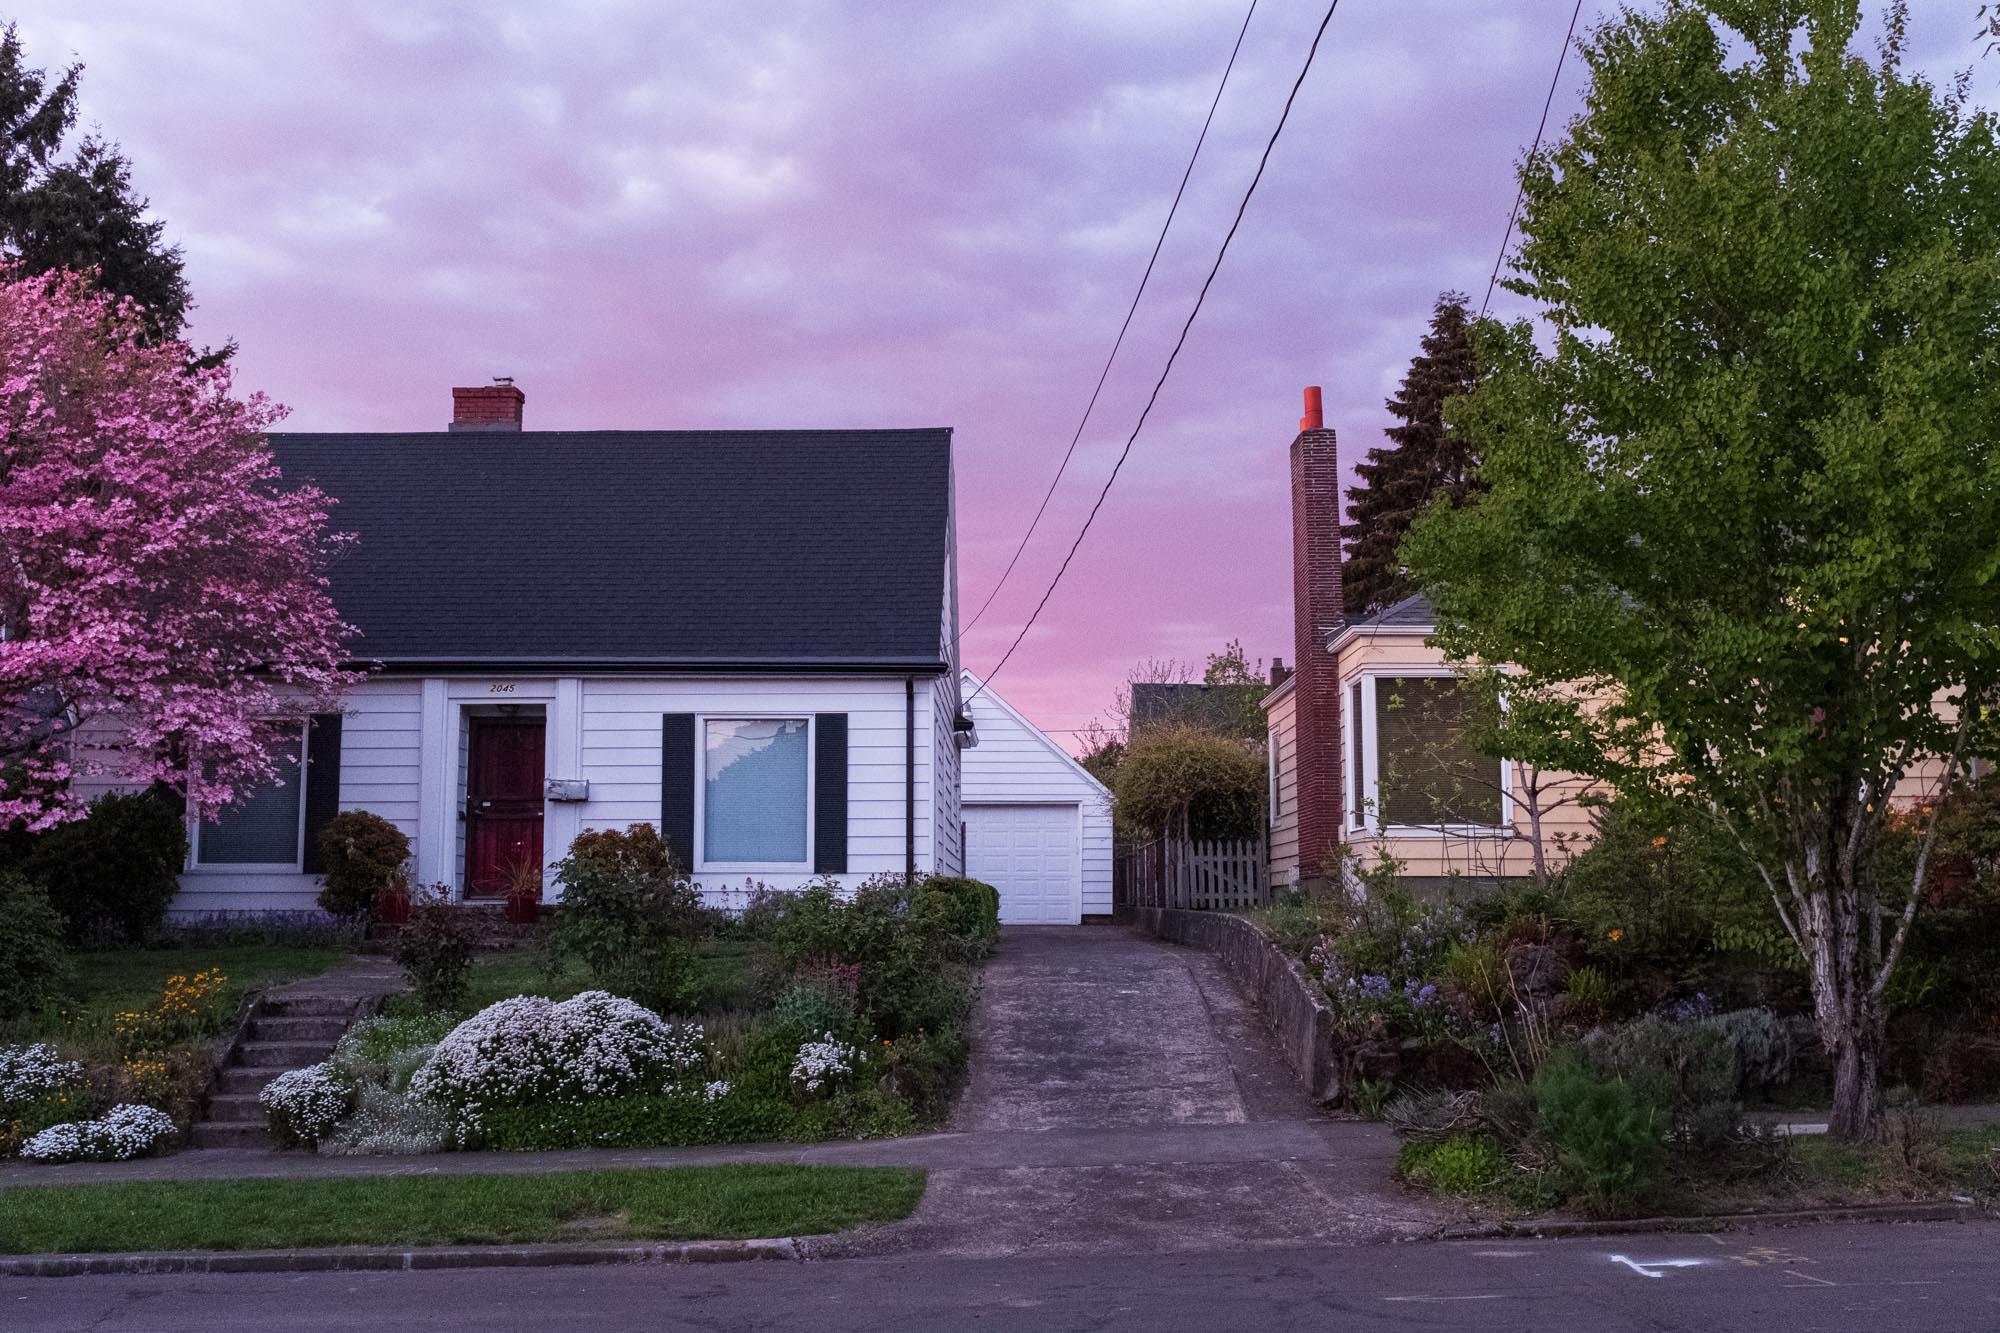 beautiful pink sky above a suburban house